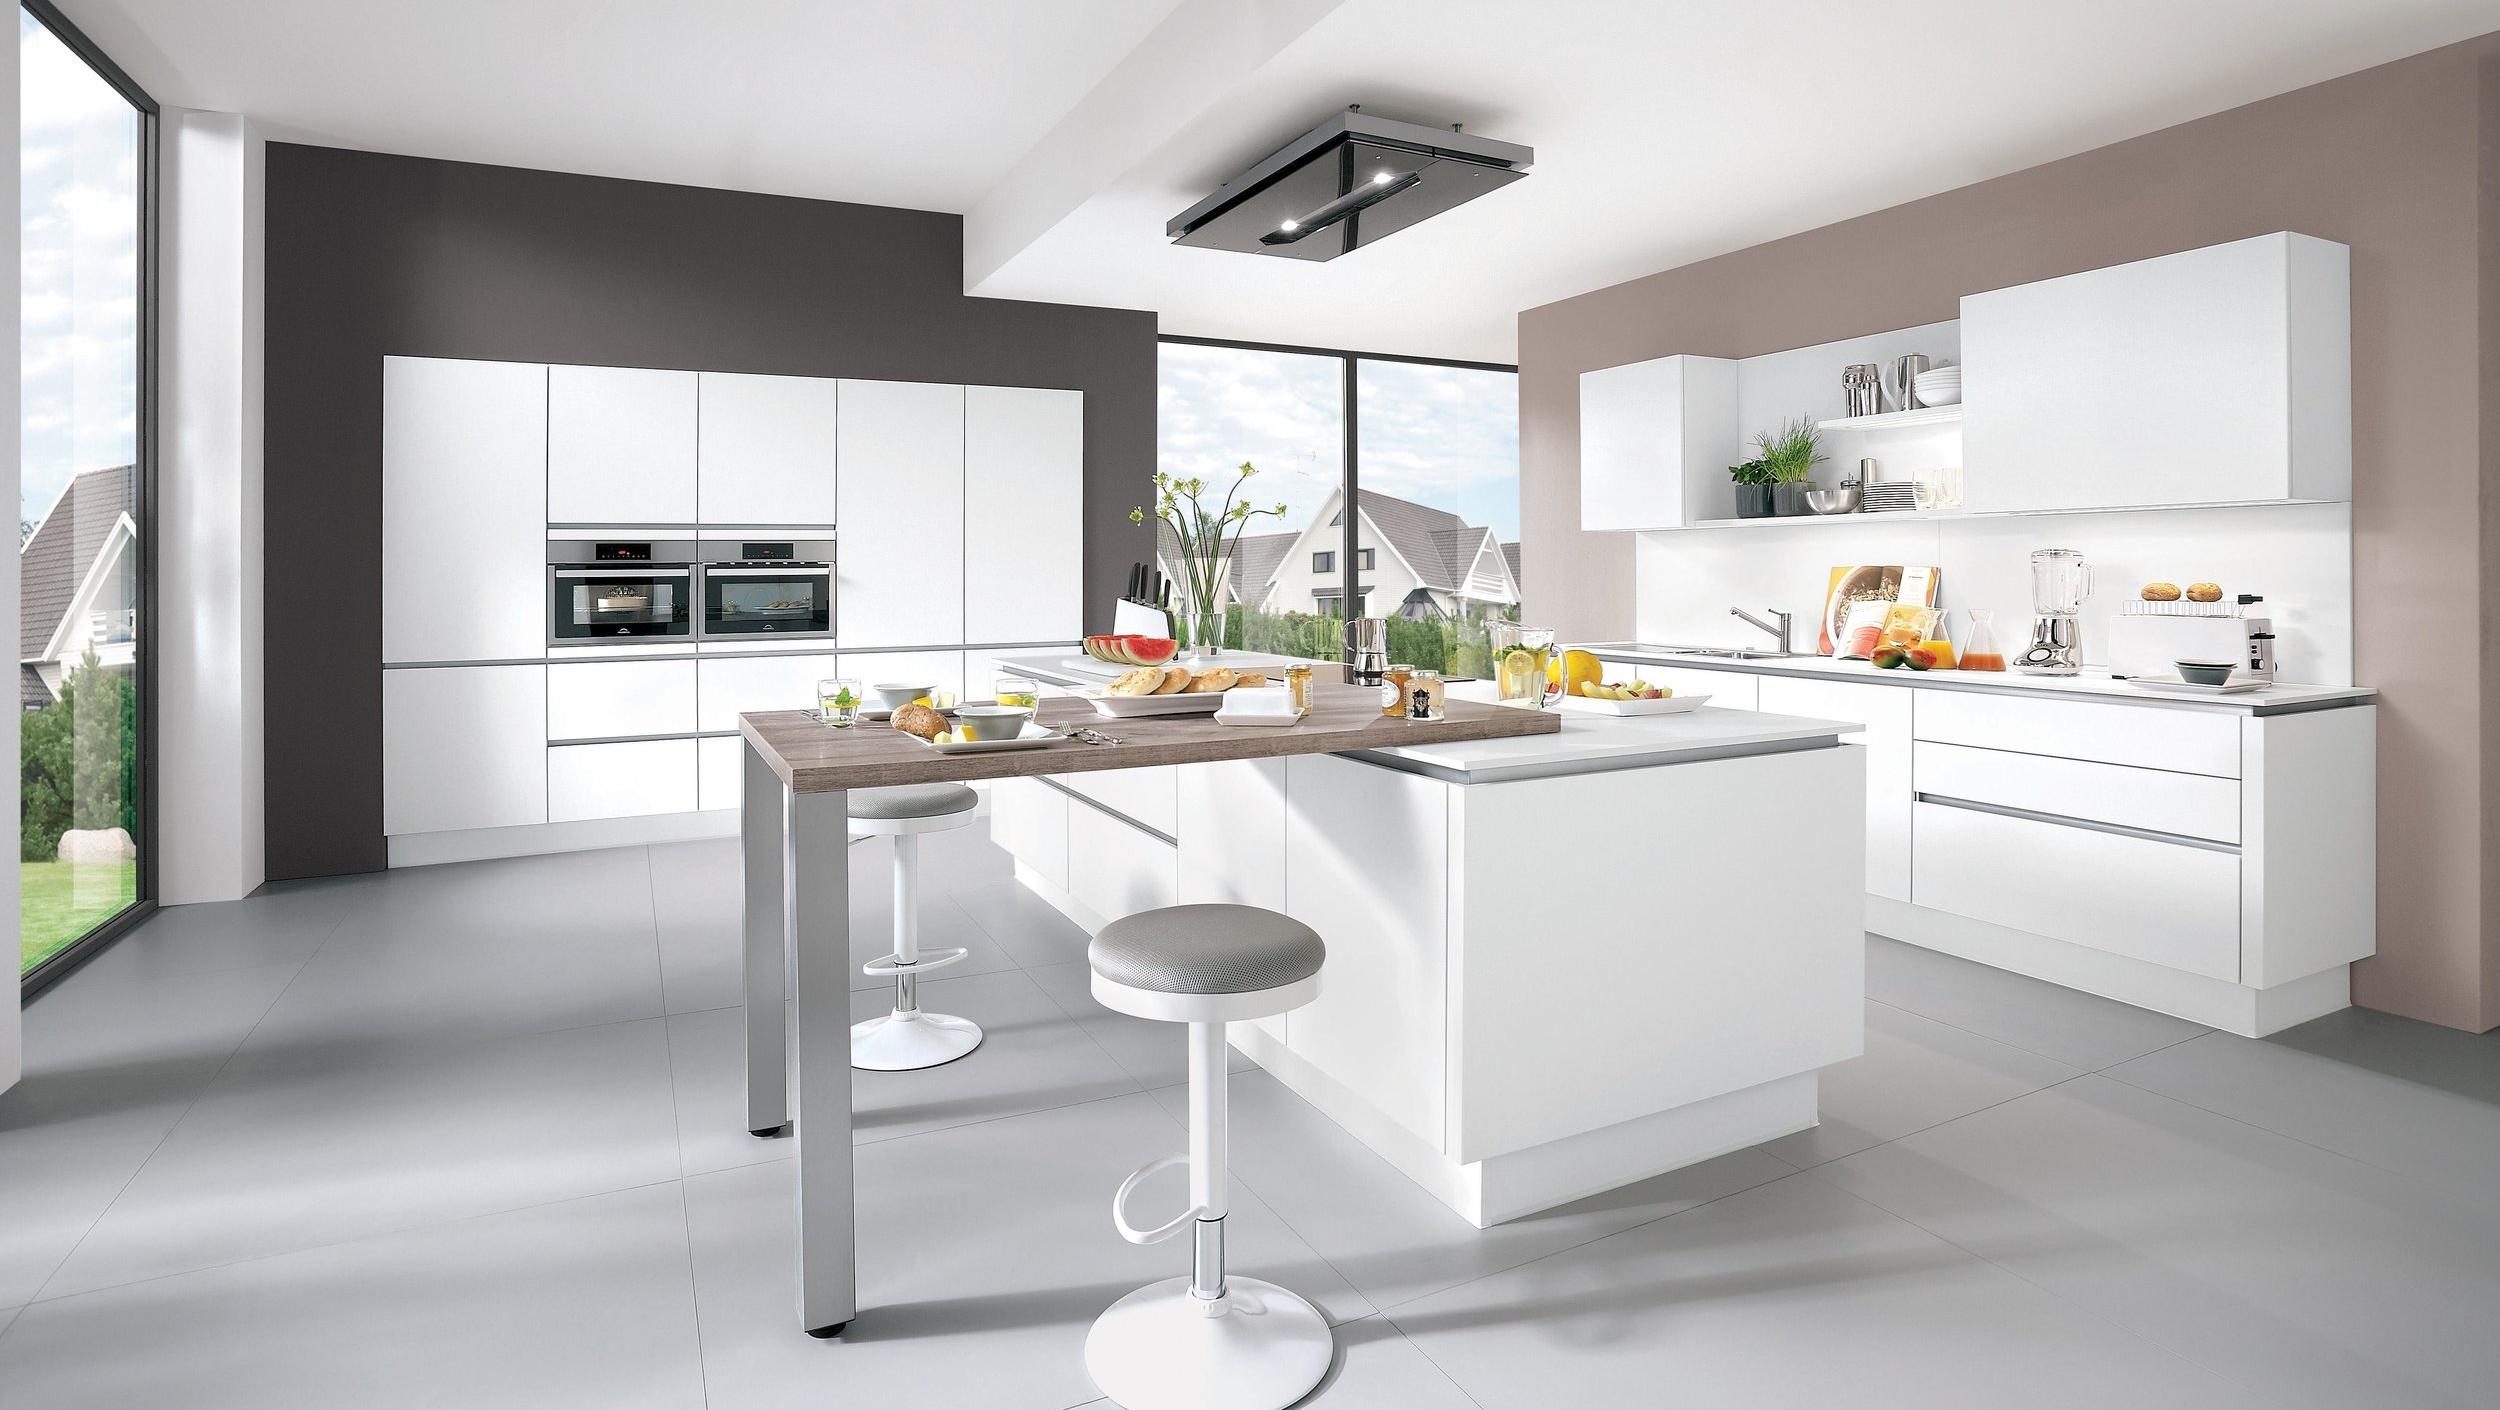 A&S Home Design German kitchen specialists in Glasgow